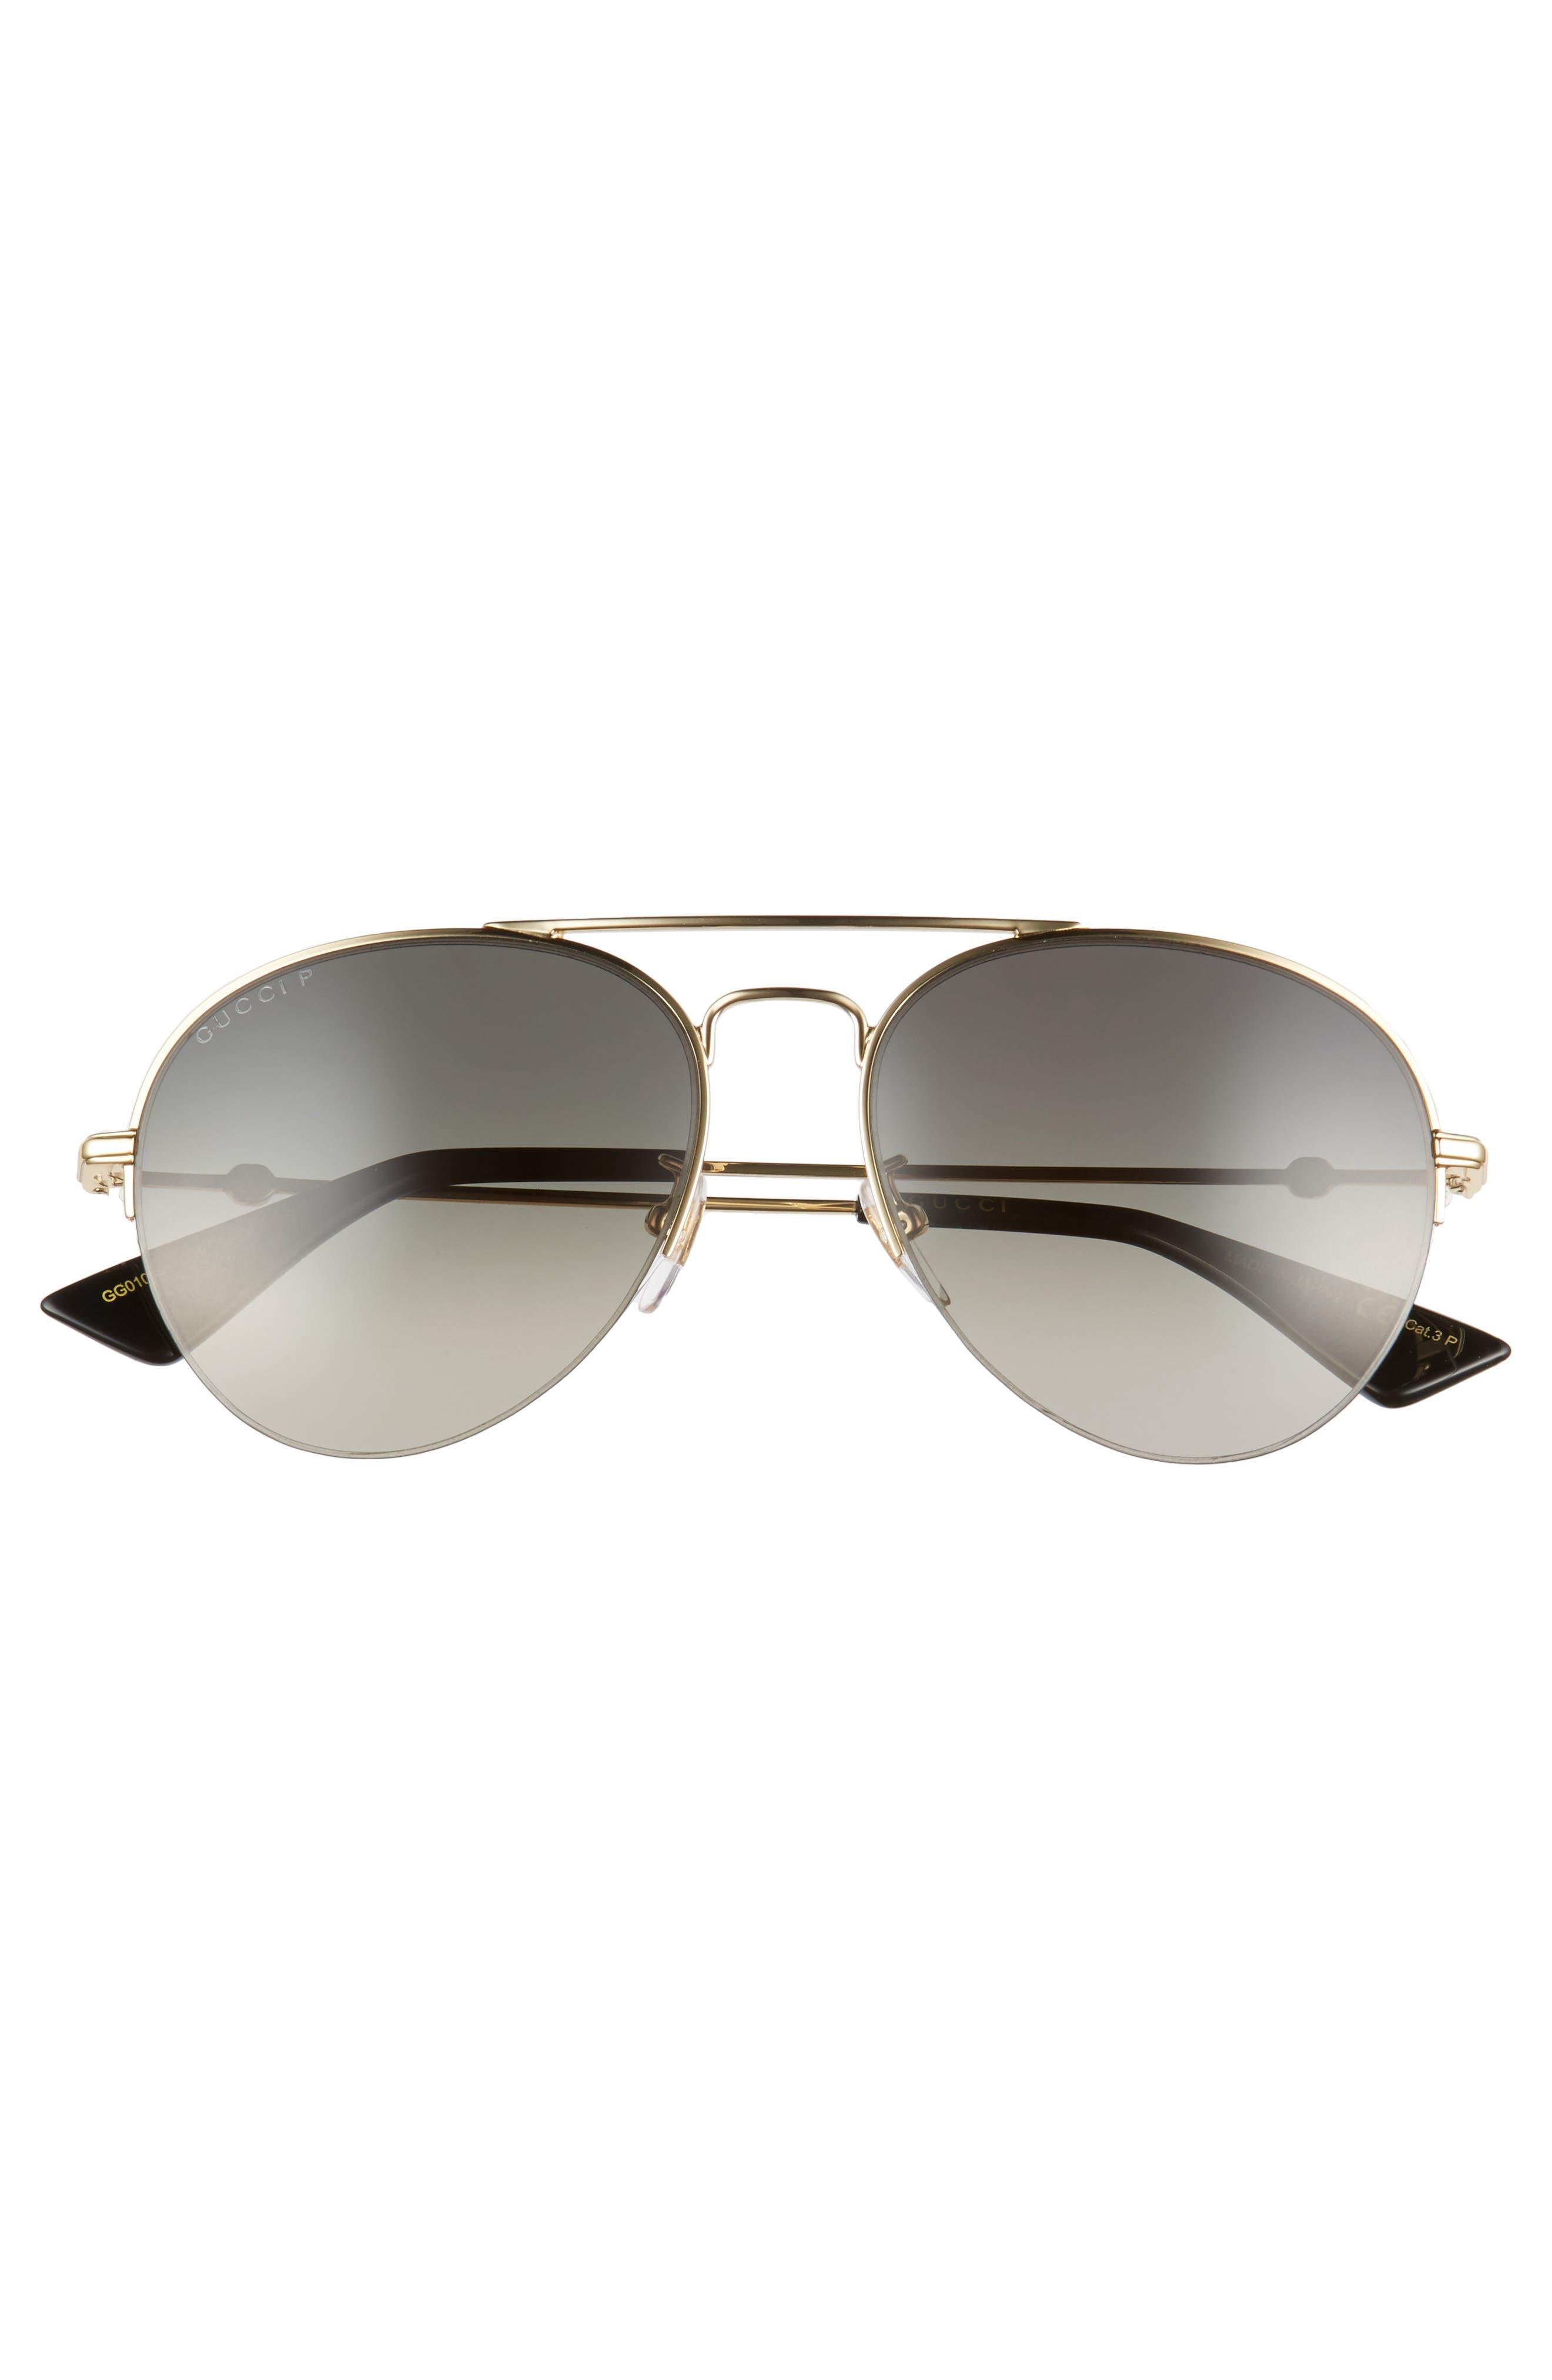 Pilot 56mm Aviator Sunglasses,                             Alternate thumbnail 2, color,                             GOLD